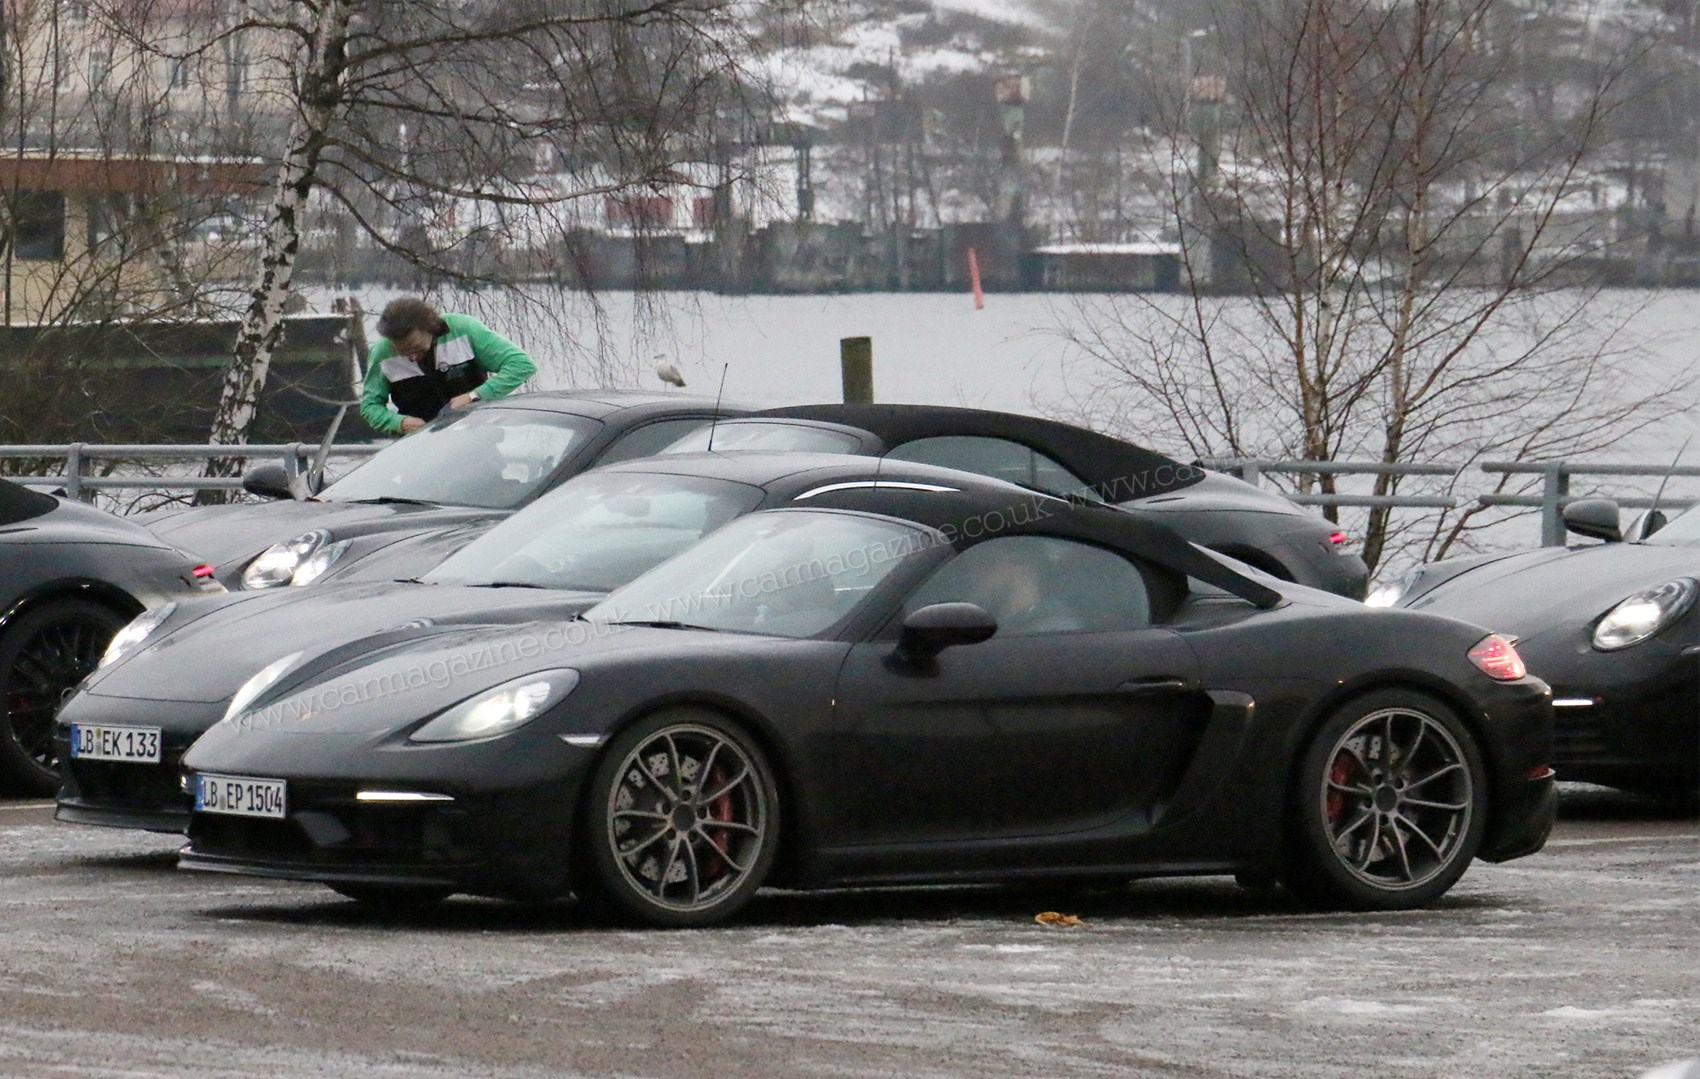 New 2018 Porsche 718 Boxster Spyder Spy Pictures News